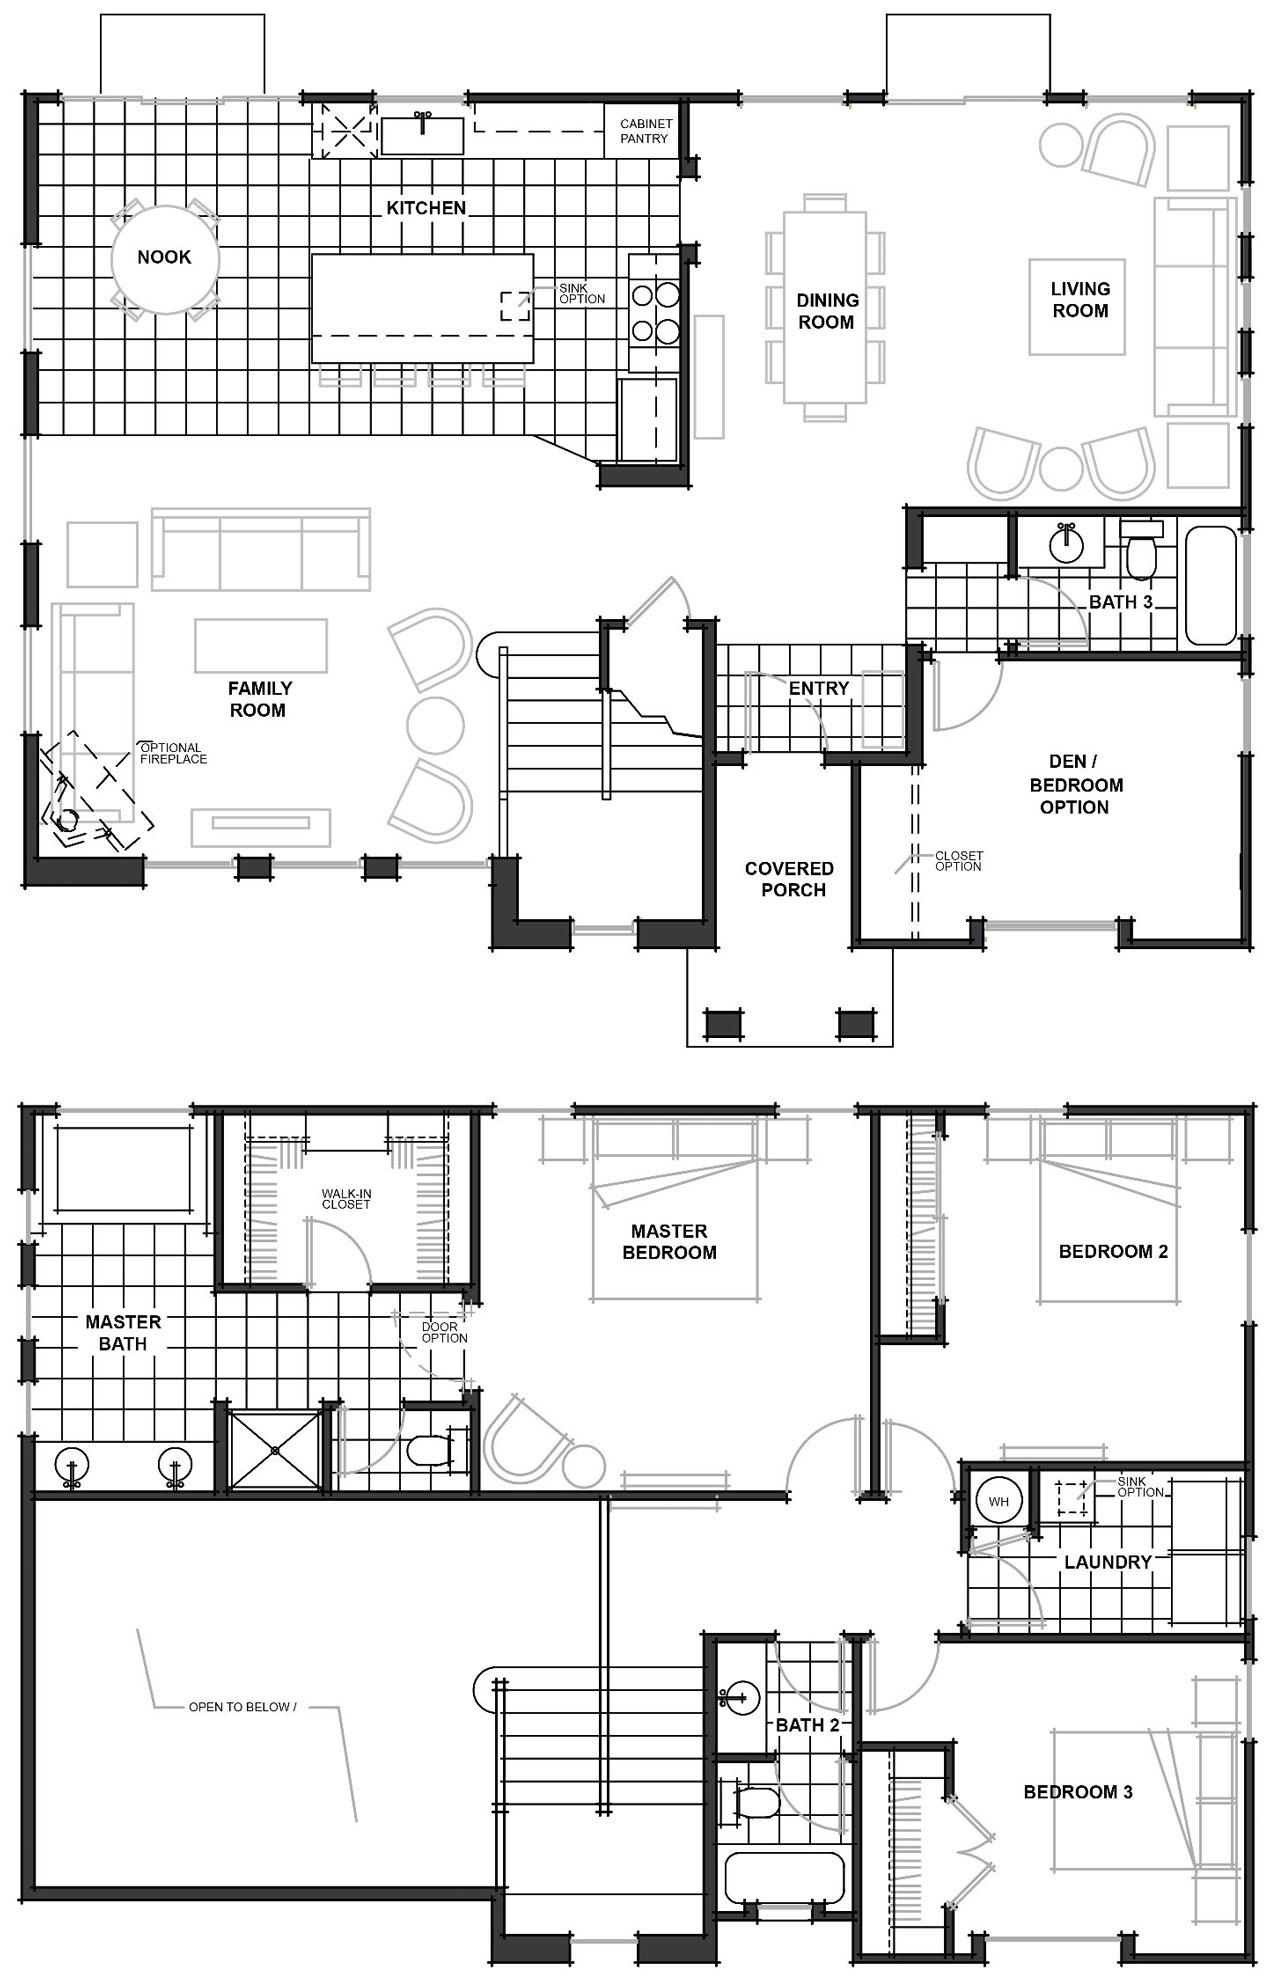 worthington floor plan - Jkb Homes Floor Plans